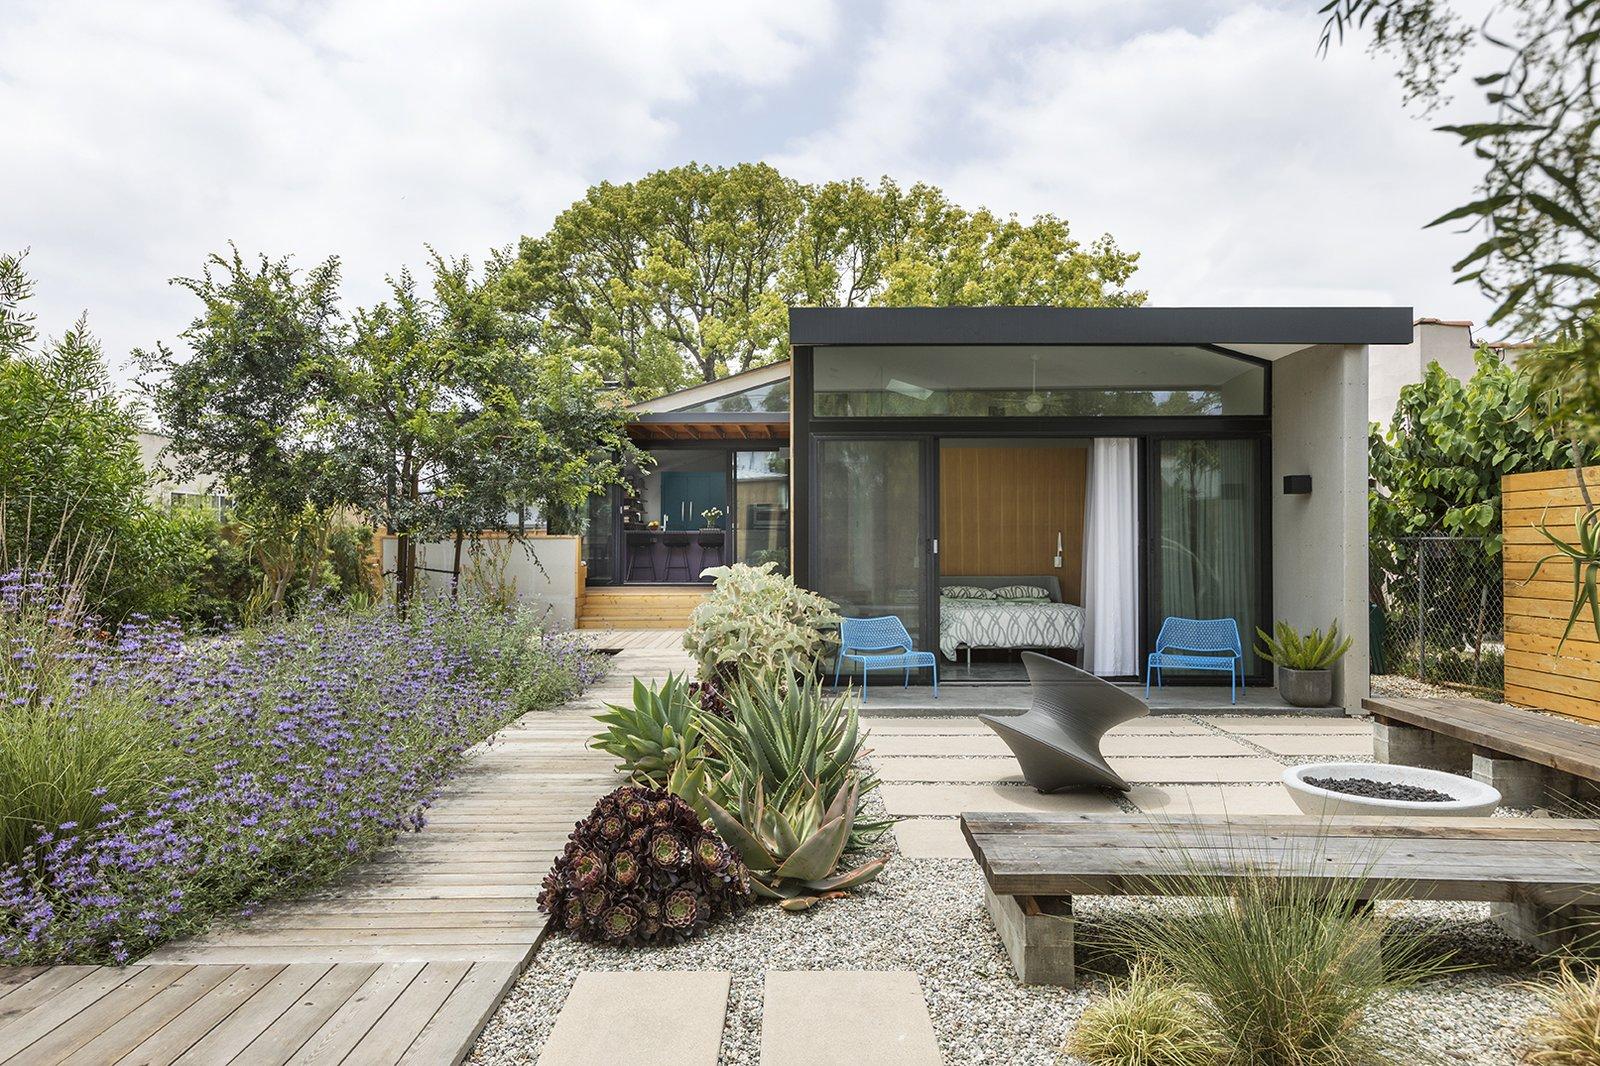 Garden & Landscapes: Design and ideas for modern homes & living